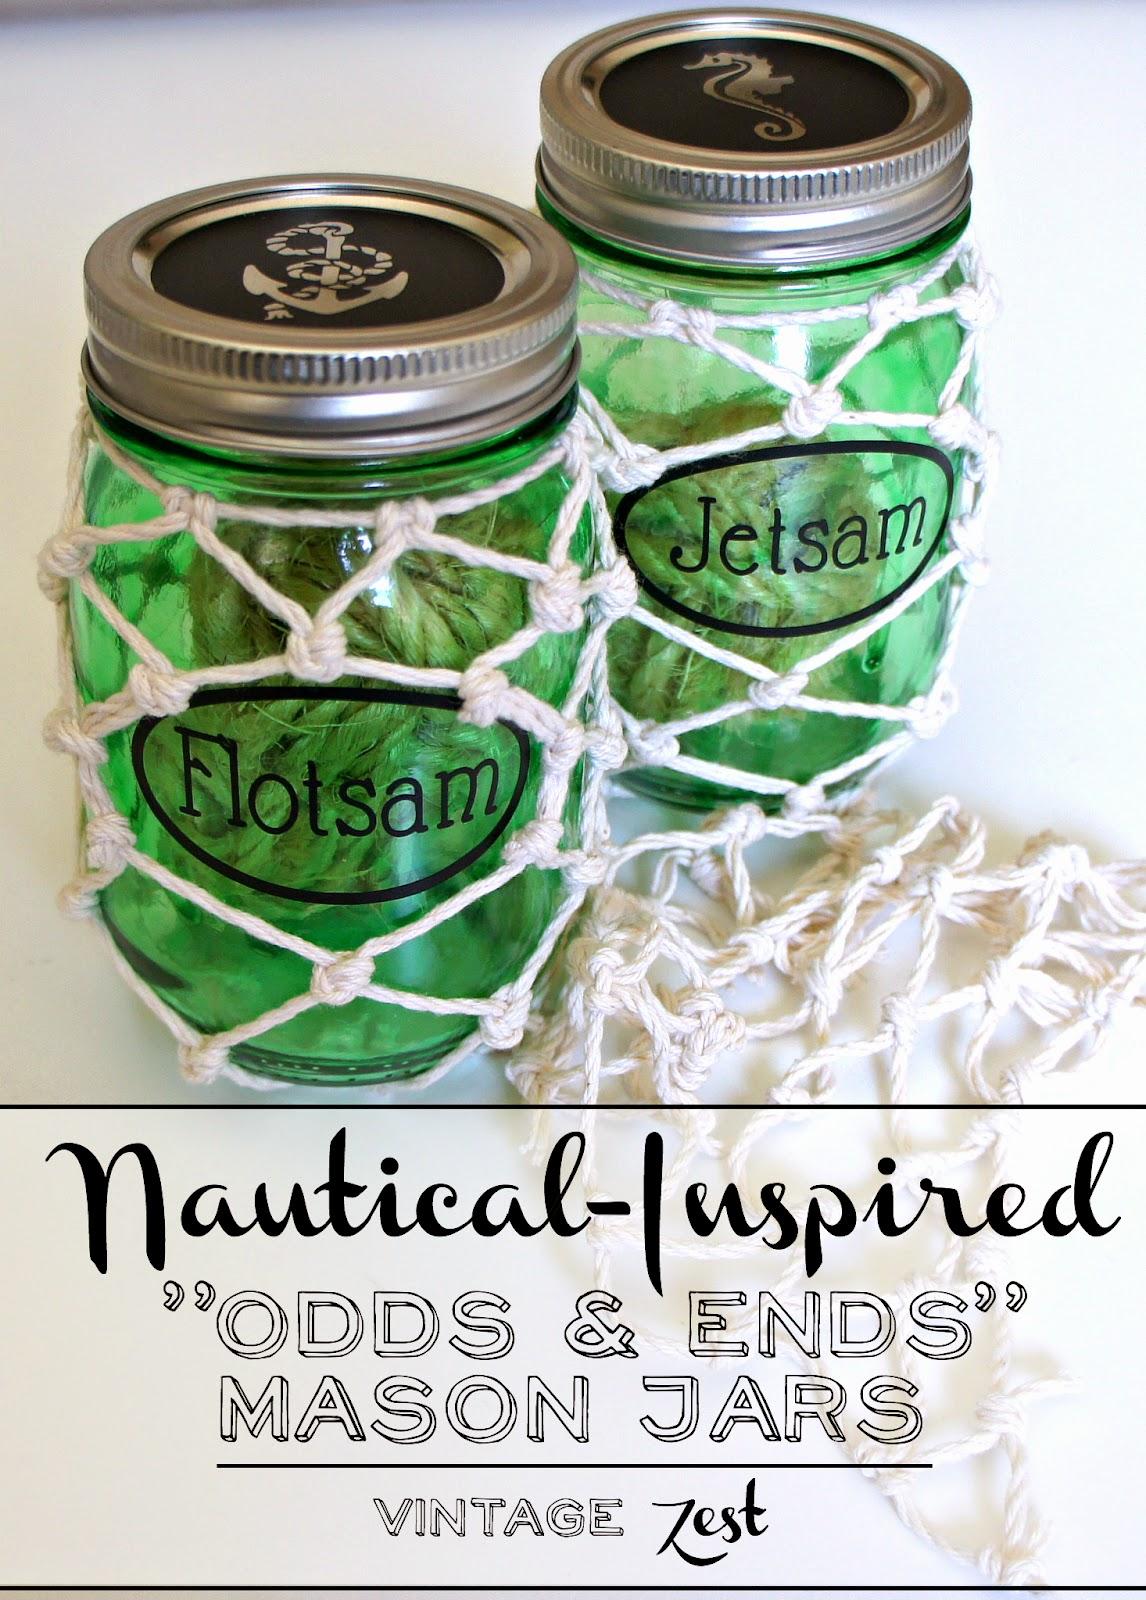 Nautical-Inspired Odds & Ends Mason Jars on Diane's Vintage Zest!